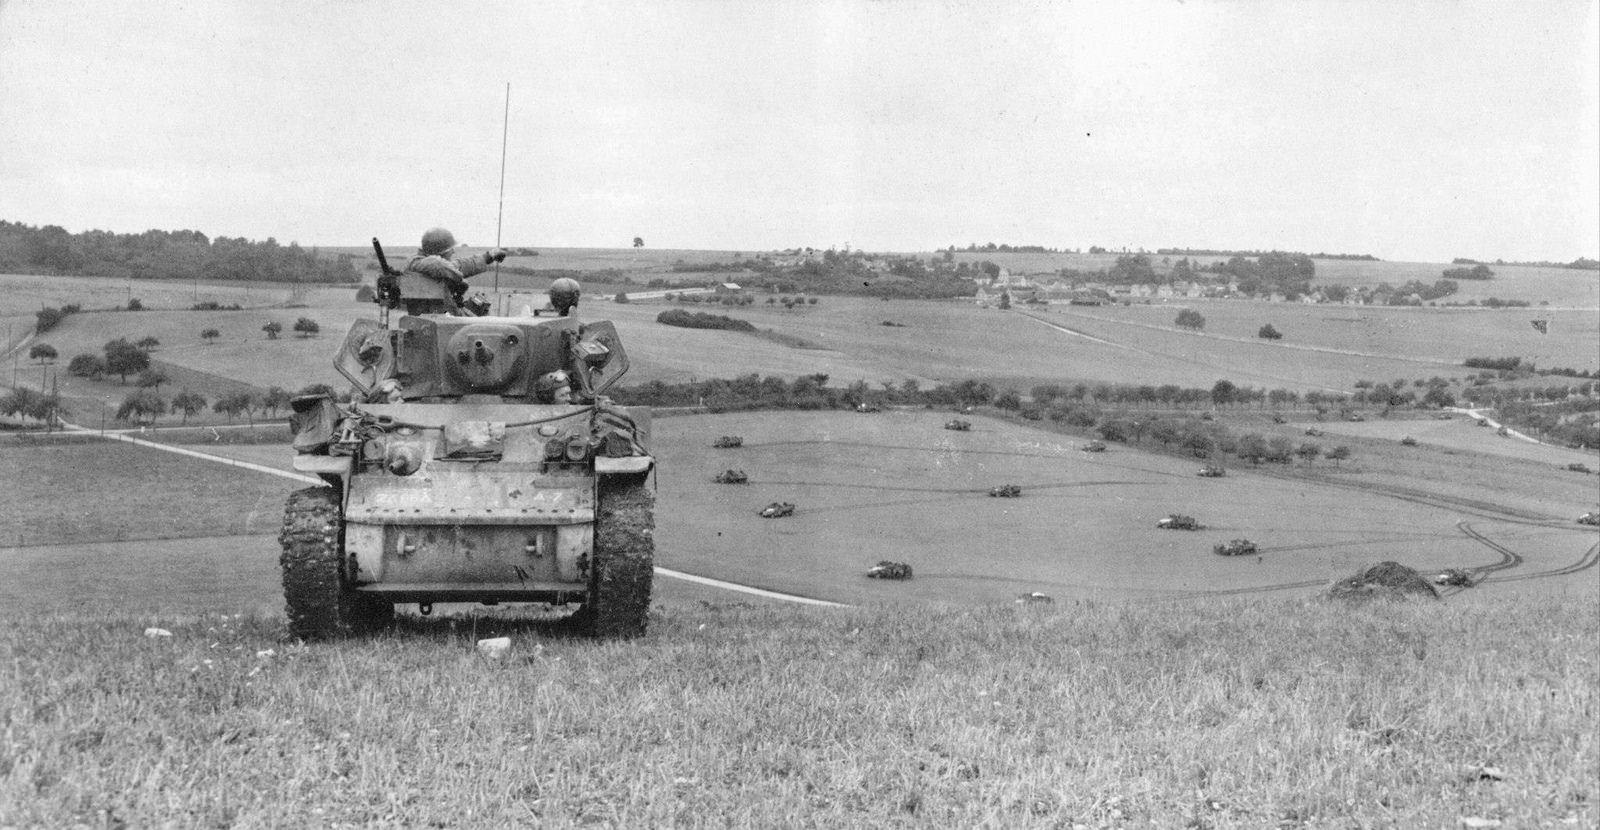 66th ARM RGT M5A1 Stuart providing overwatch of a mechanised infantry company near Buchet, France, 31 Aug 1944.